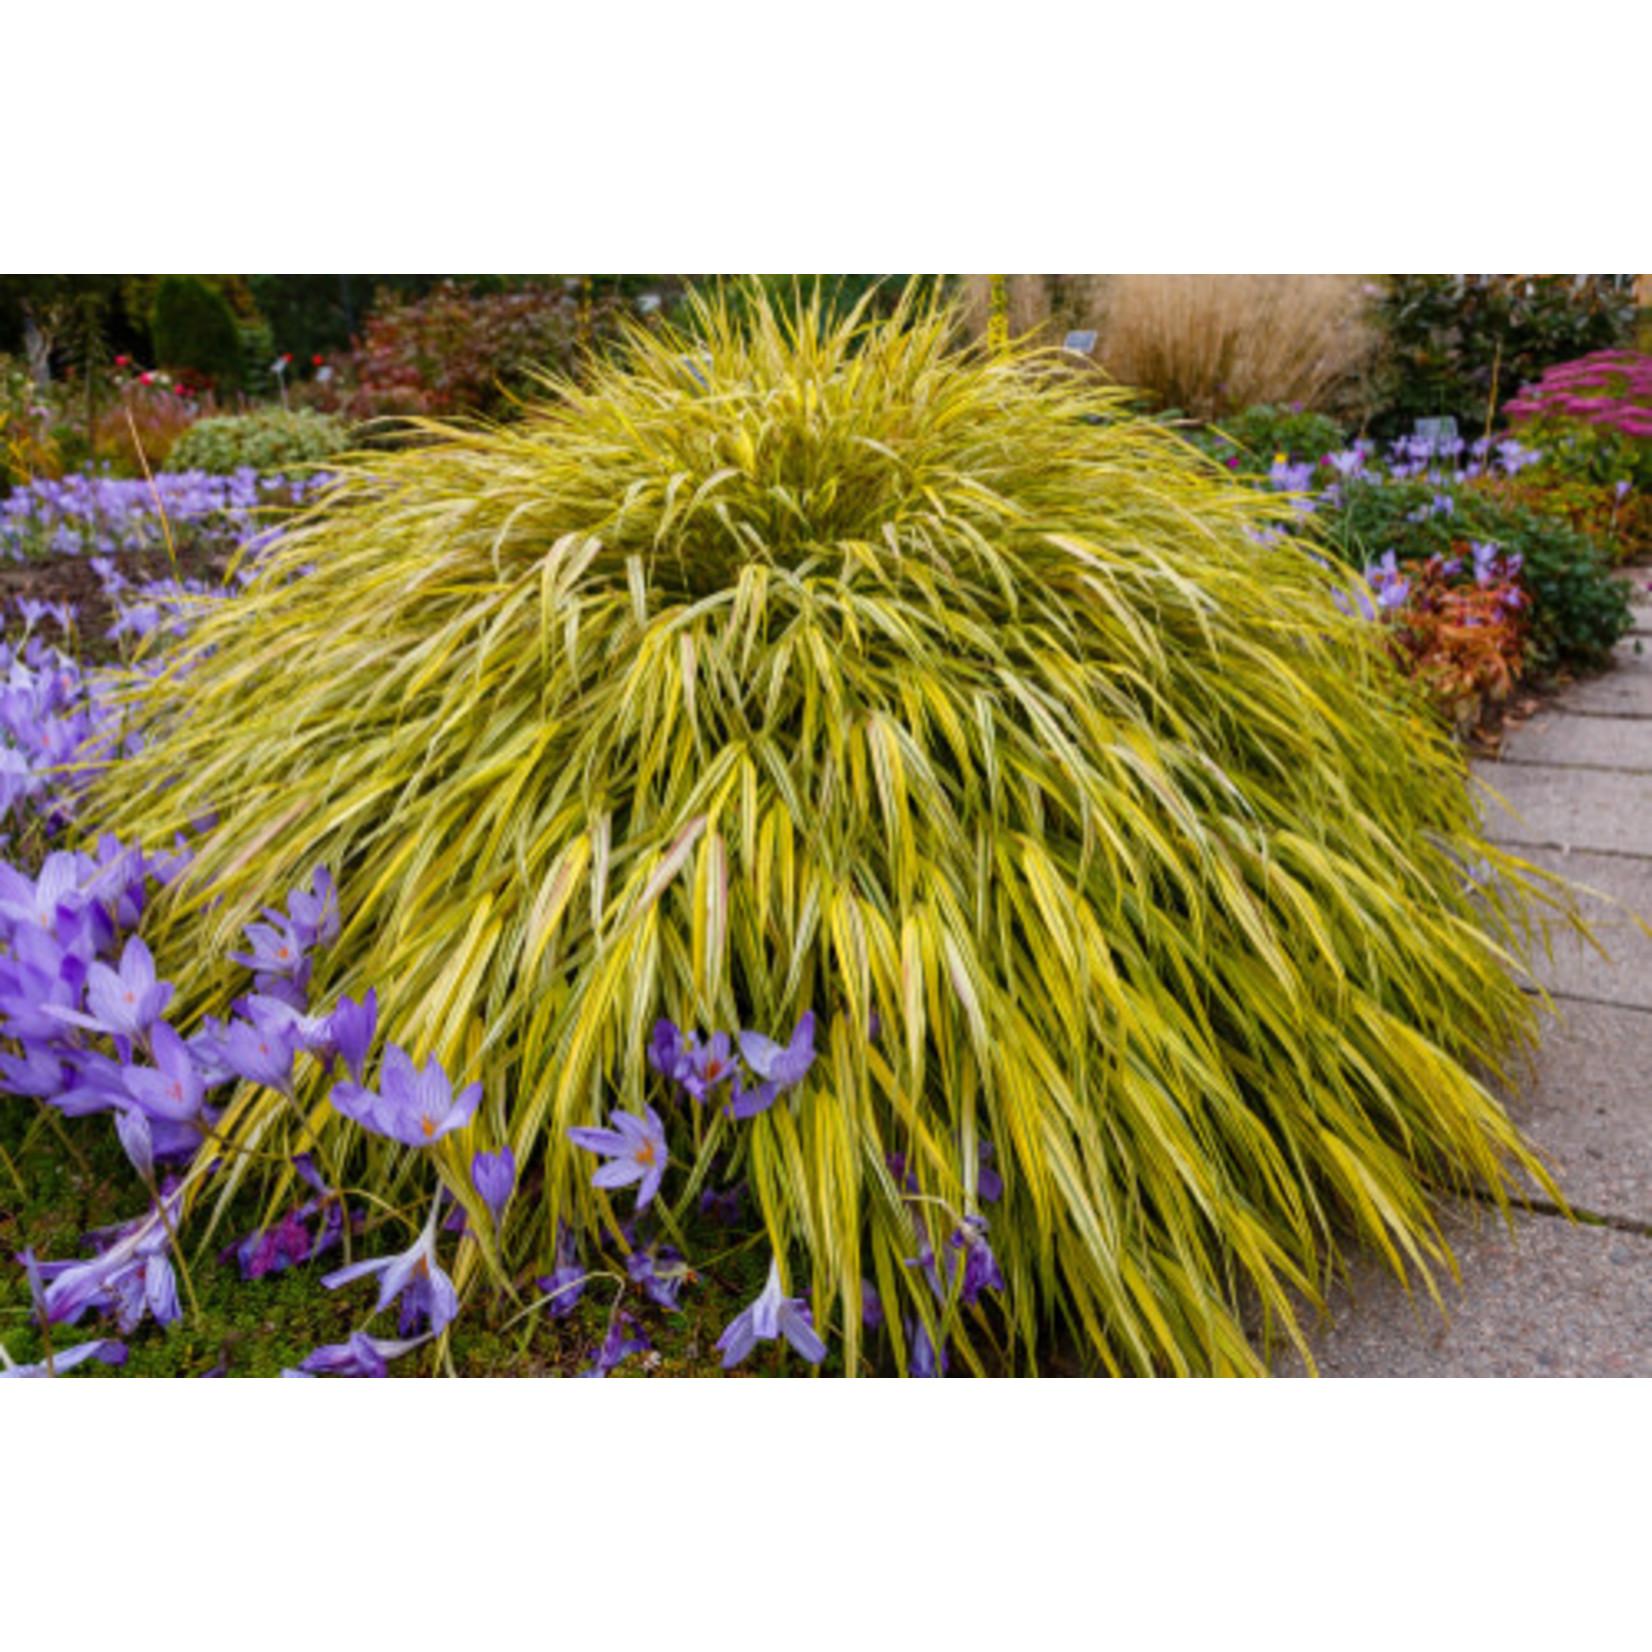 Japanese Forest Grass - hakonechloa 'aureola' - 2 gal